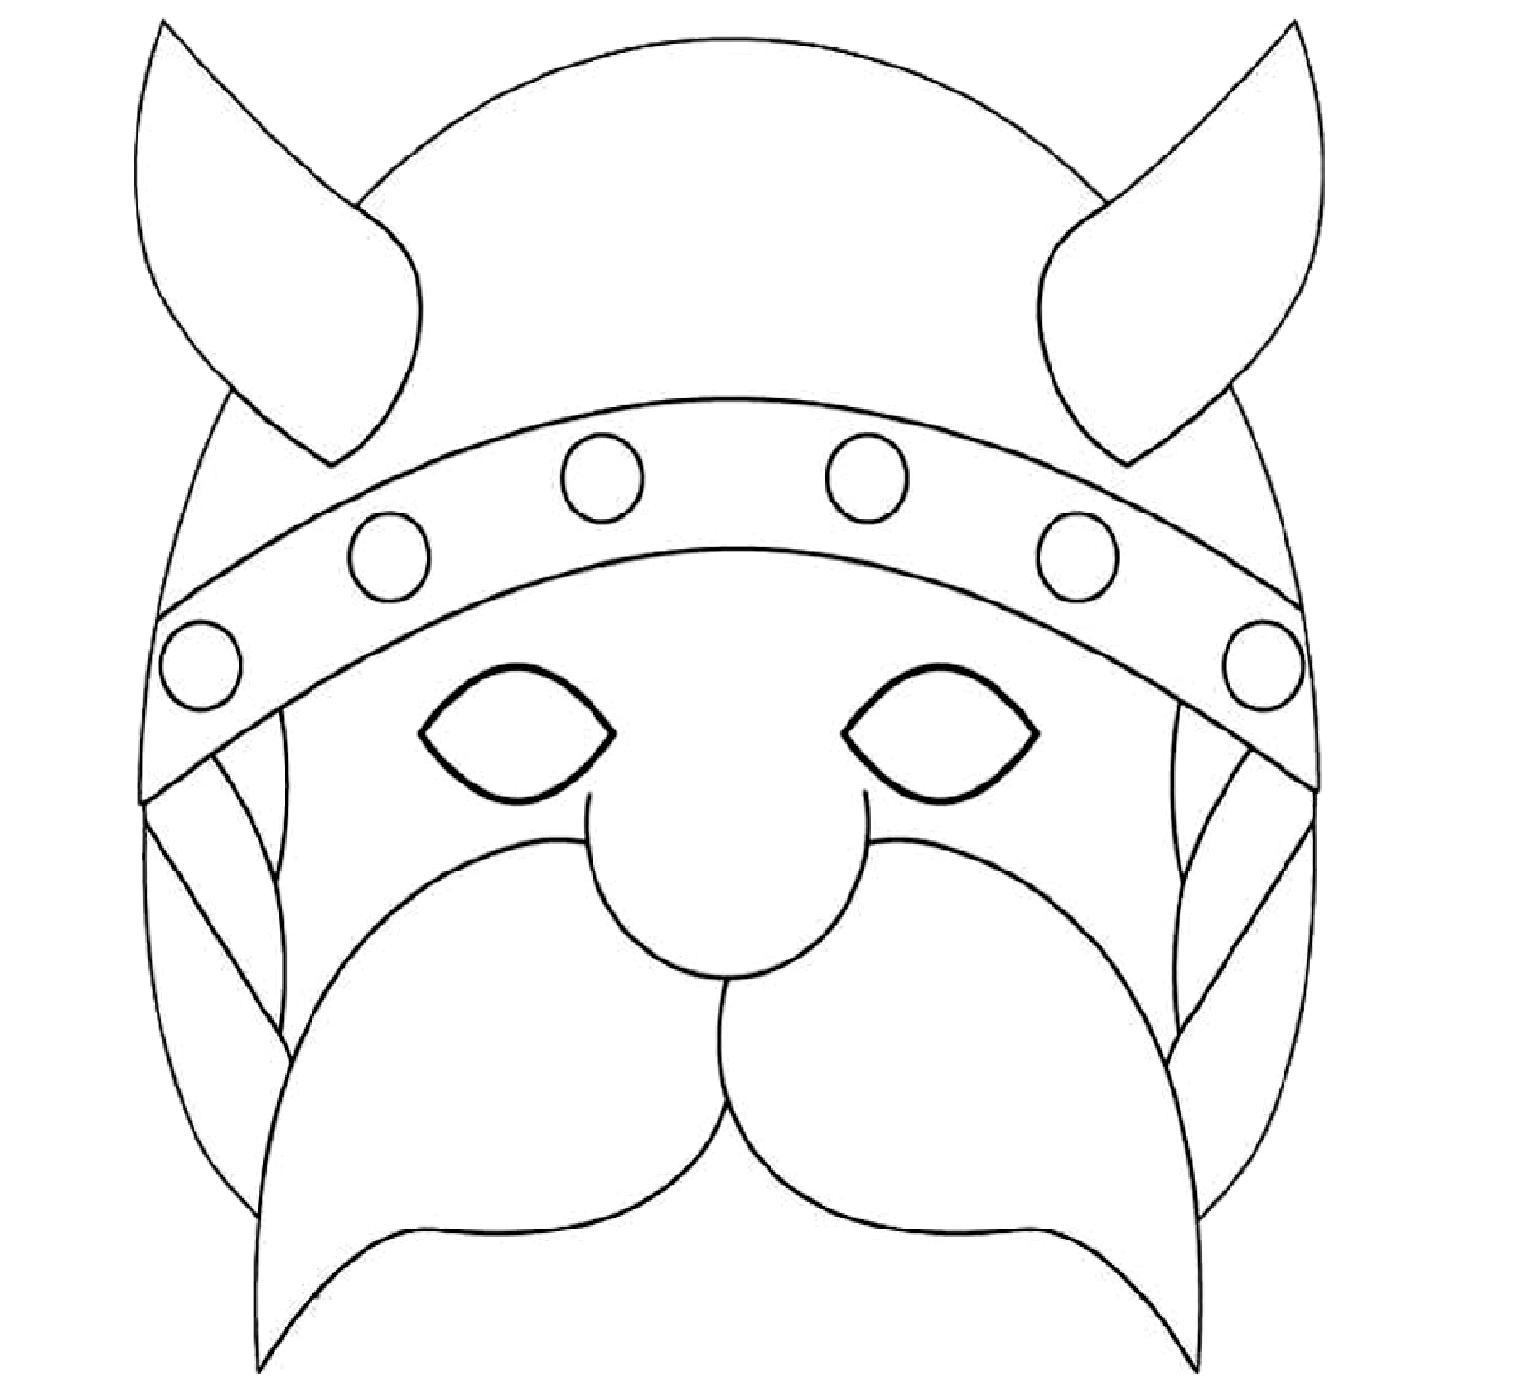 masque gaulois a colorier d coupage a imprimer. Black Bedroom Furniture Sets. Home Design Ideas